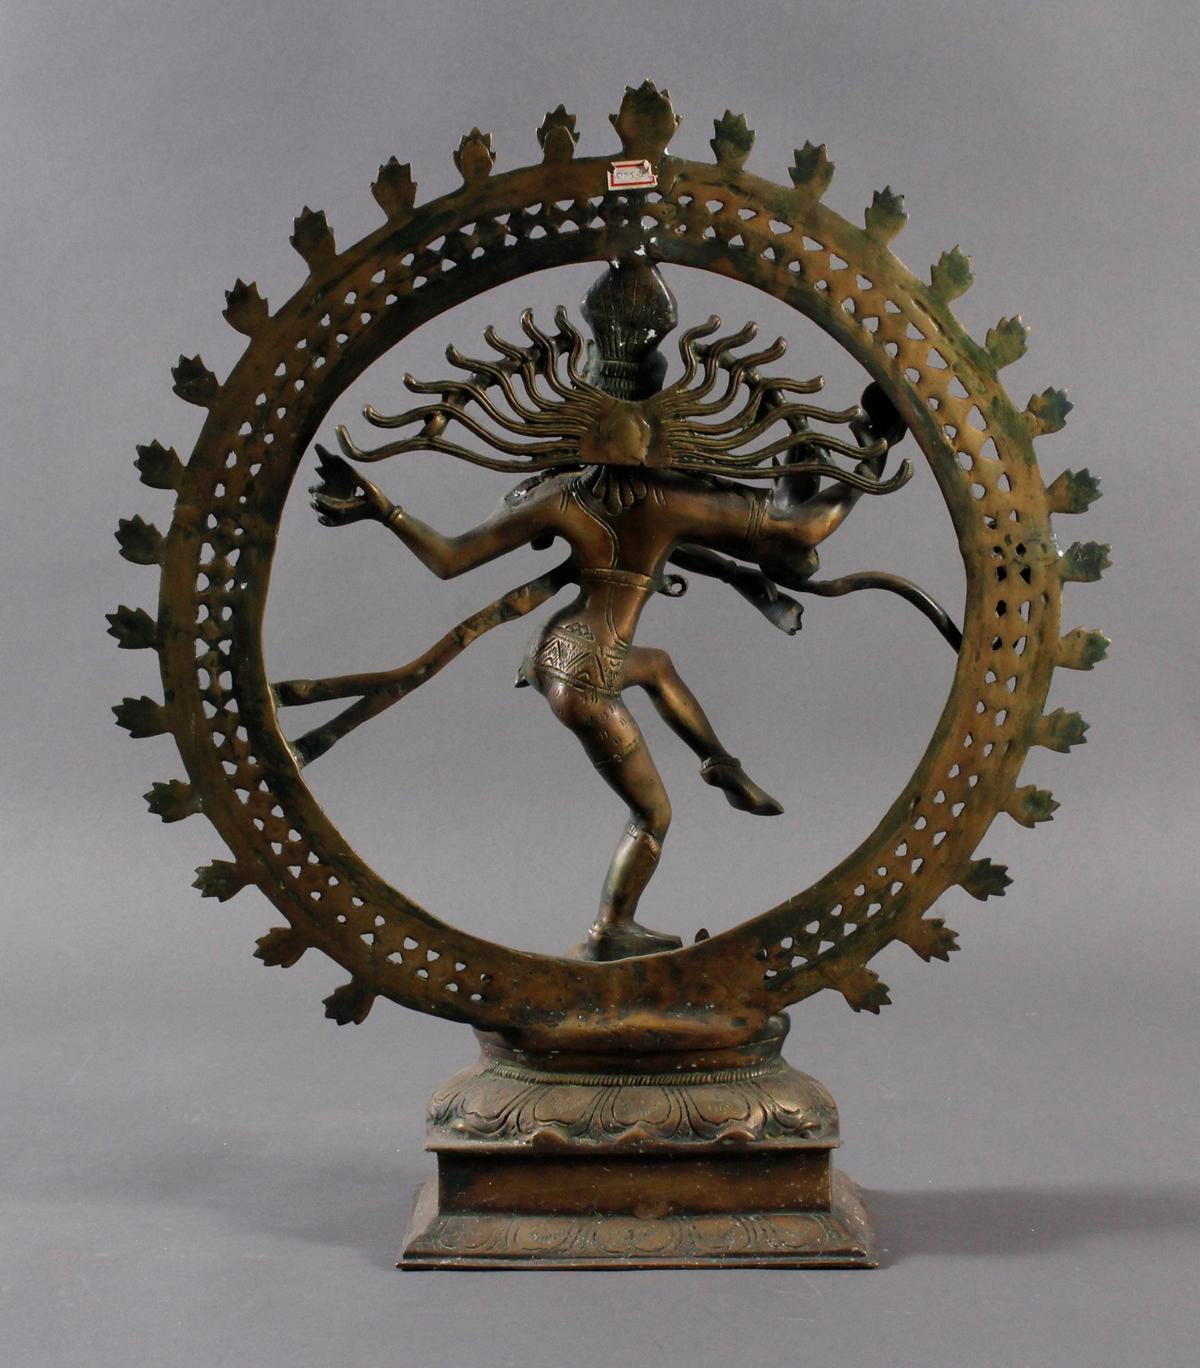 Nataraja Shiva im Flammenrad, Indien, 19. / 20. Jahrhundert-4